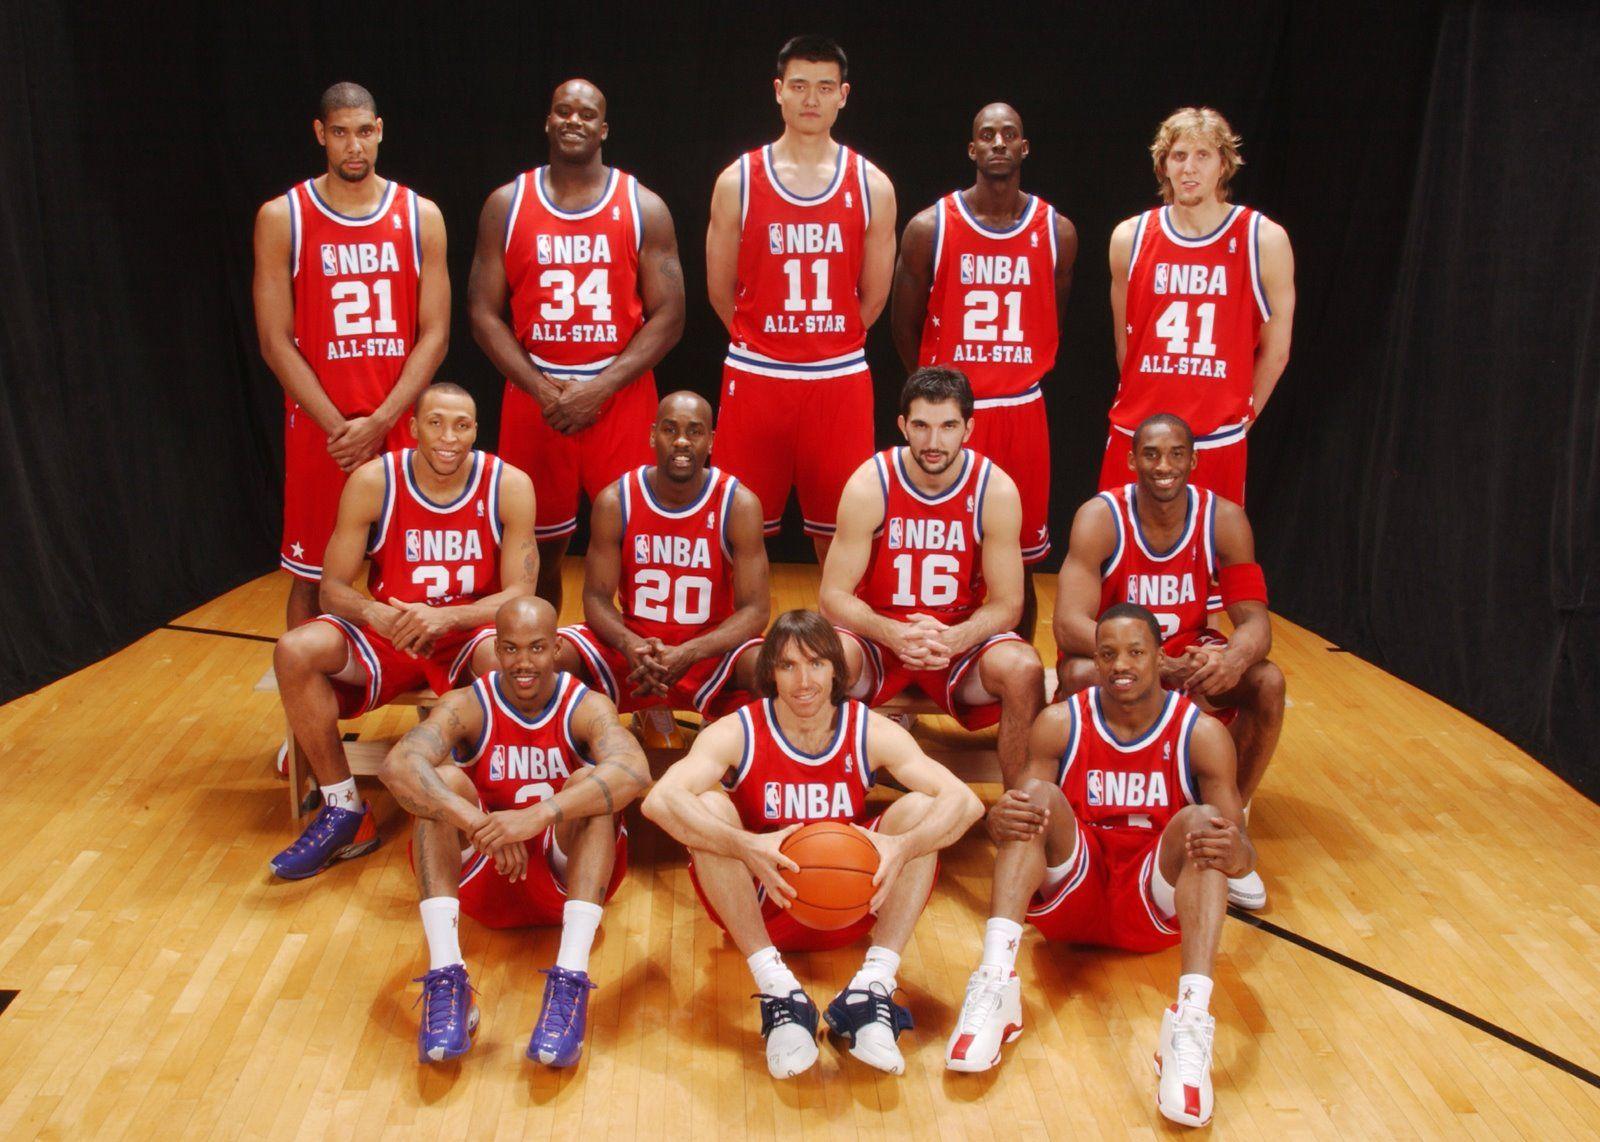 597c6c30a 2003 NBA All Star Game west team